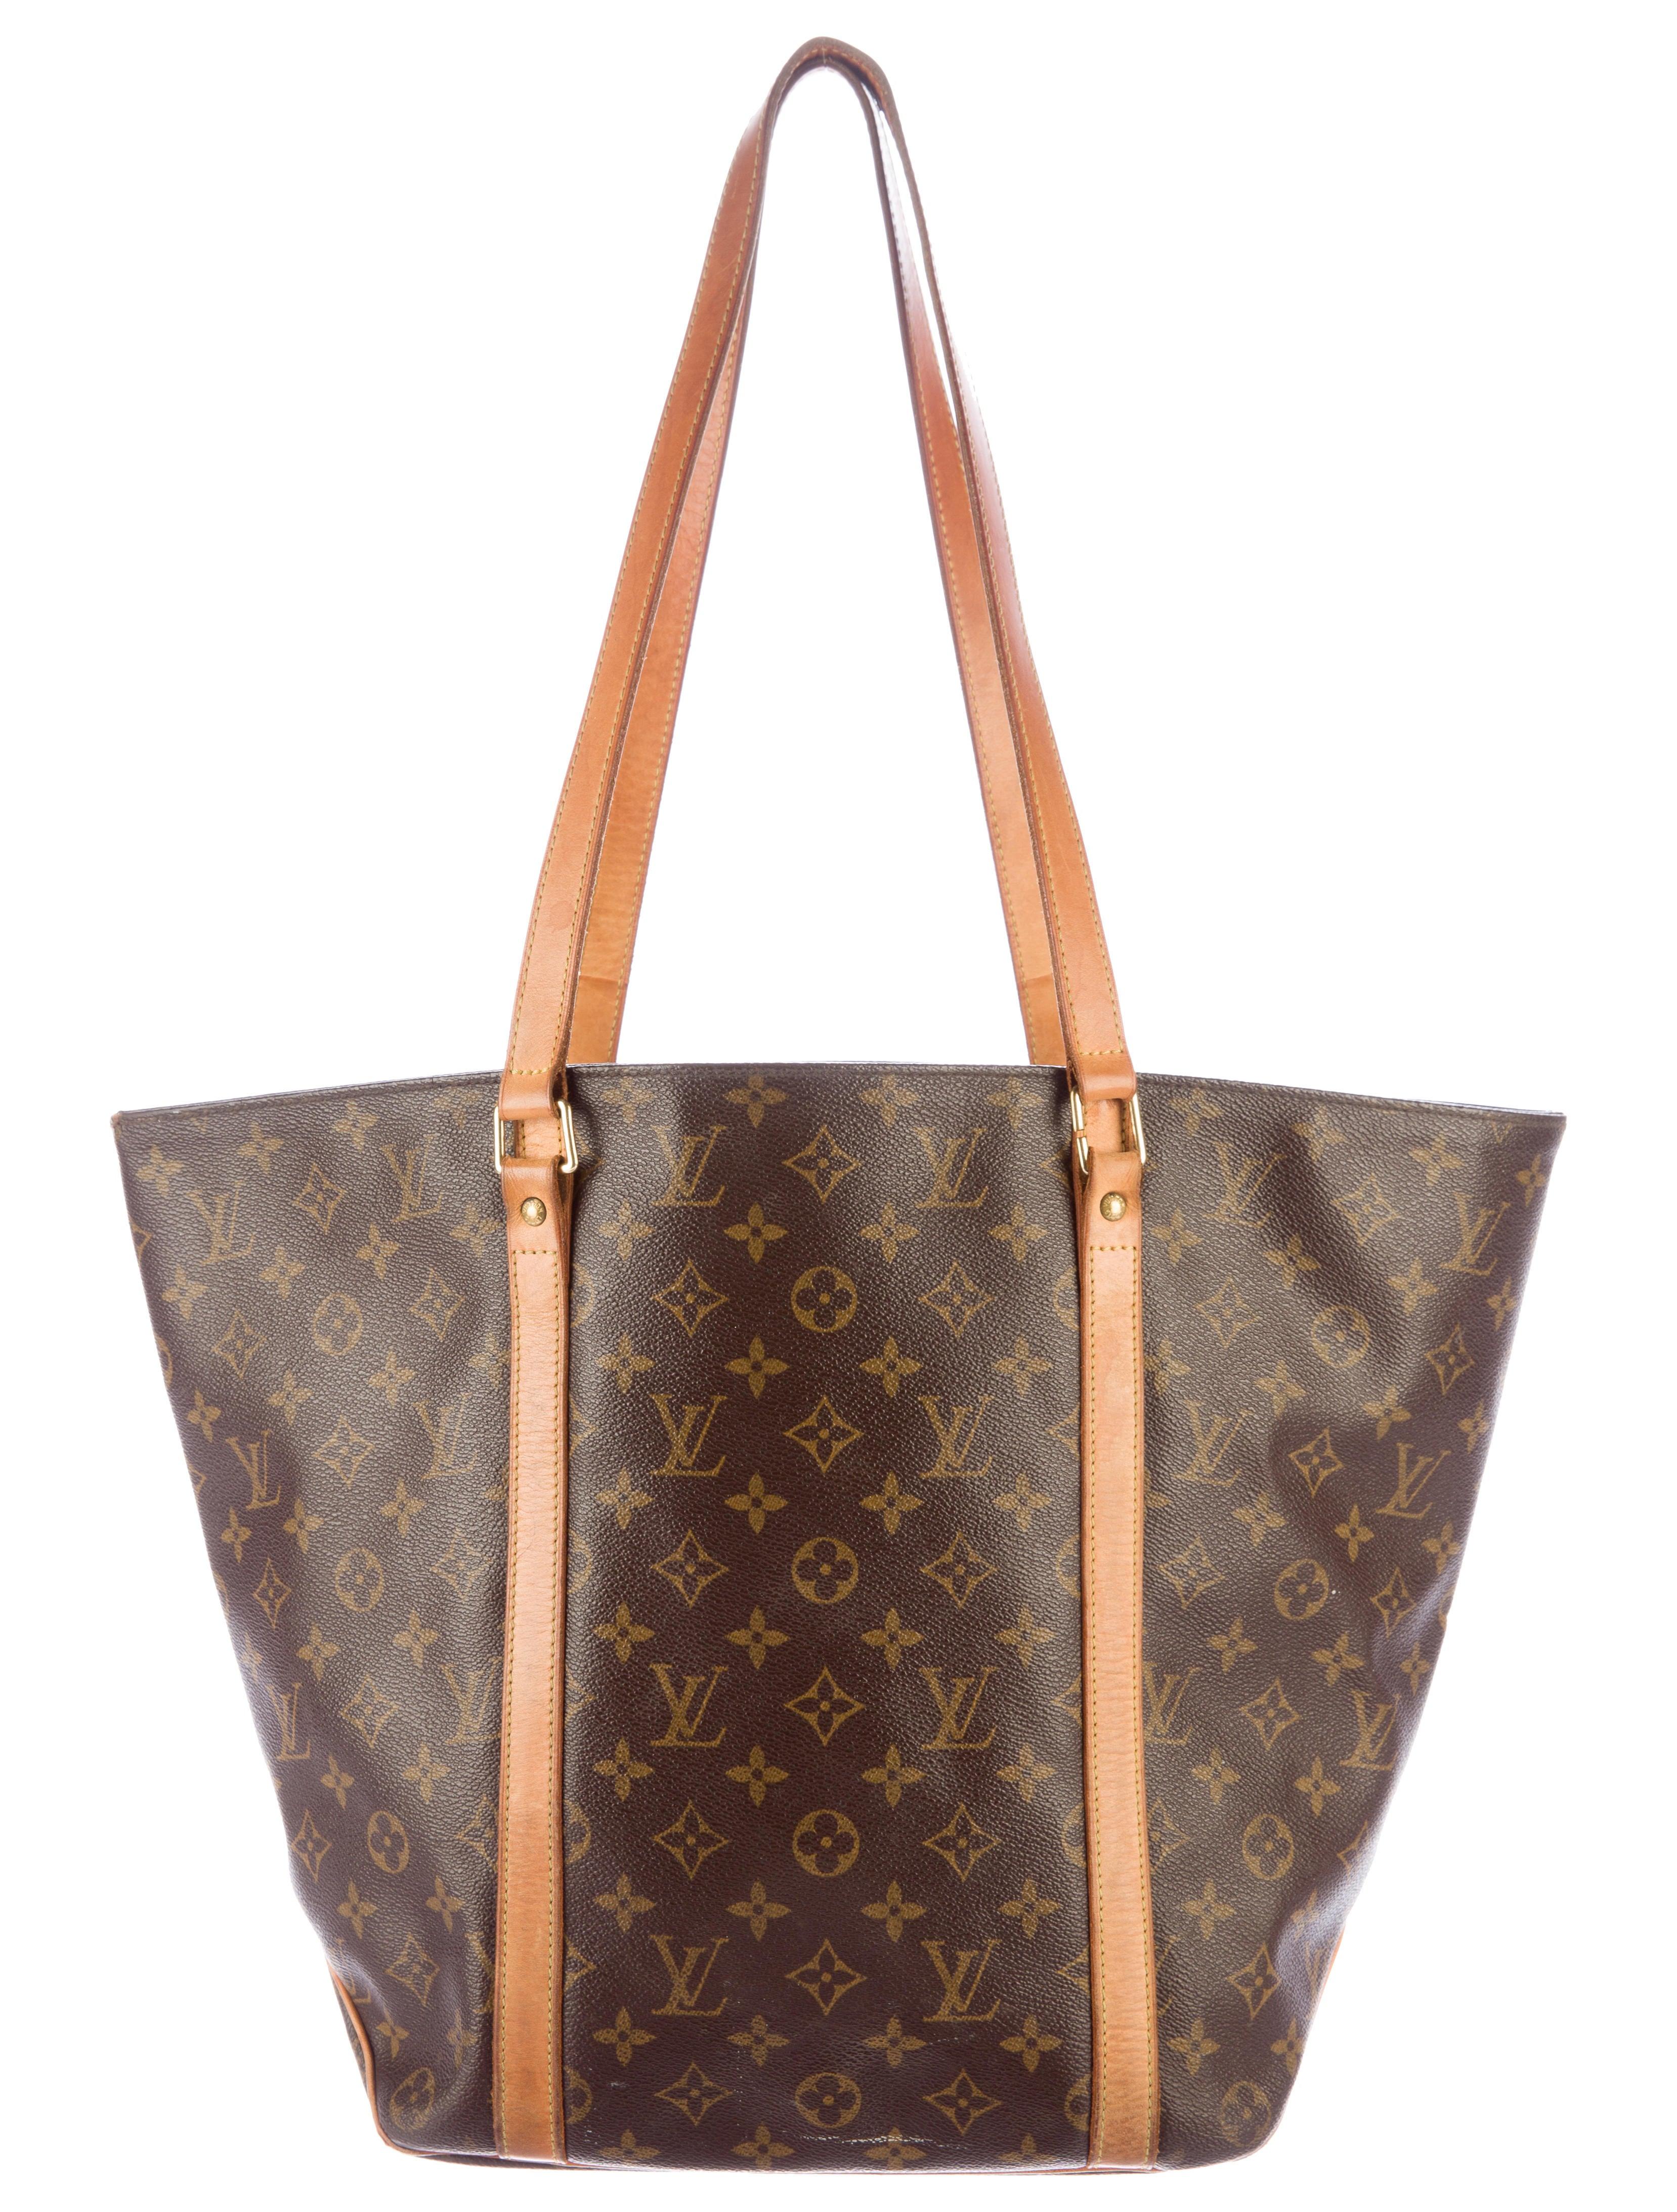 louis vuitton monogram sac shopping gm handbags. Black Bedroom Furniture Sets. Home Design Ideas